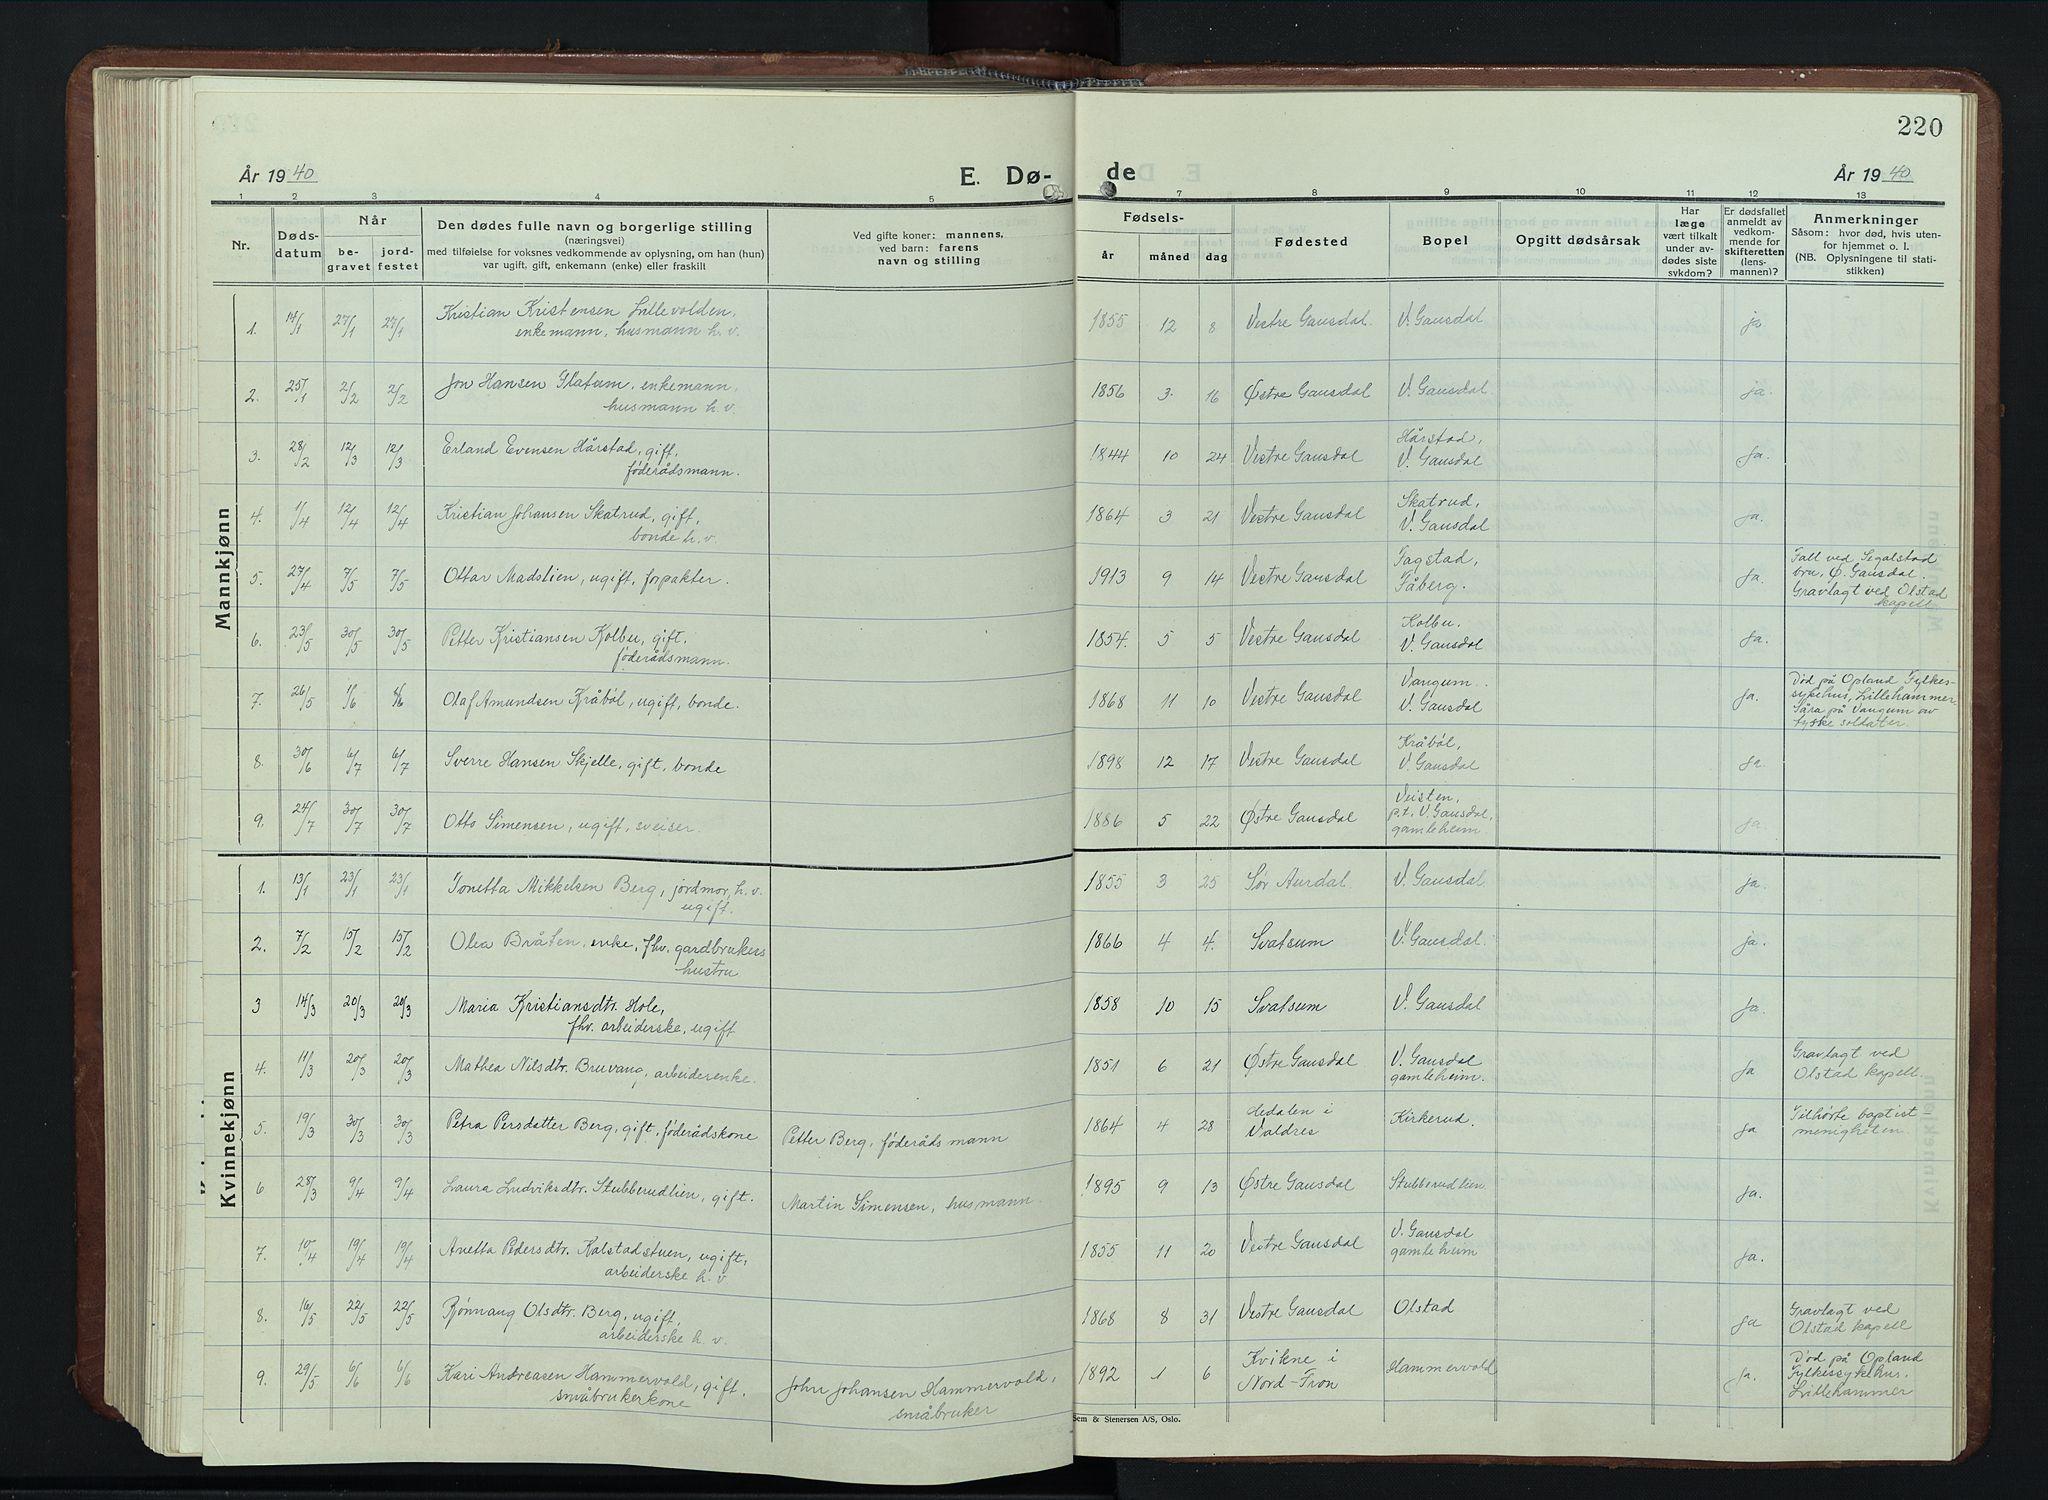 SAH, Vestre Gausdal prestekontor, Klokkerbok nr. 5, 1926-1955, s. 220